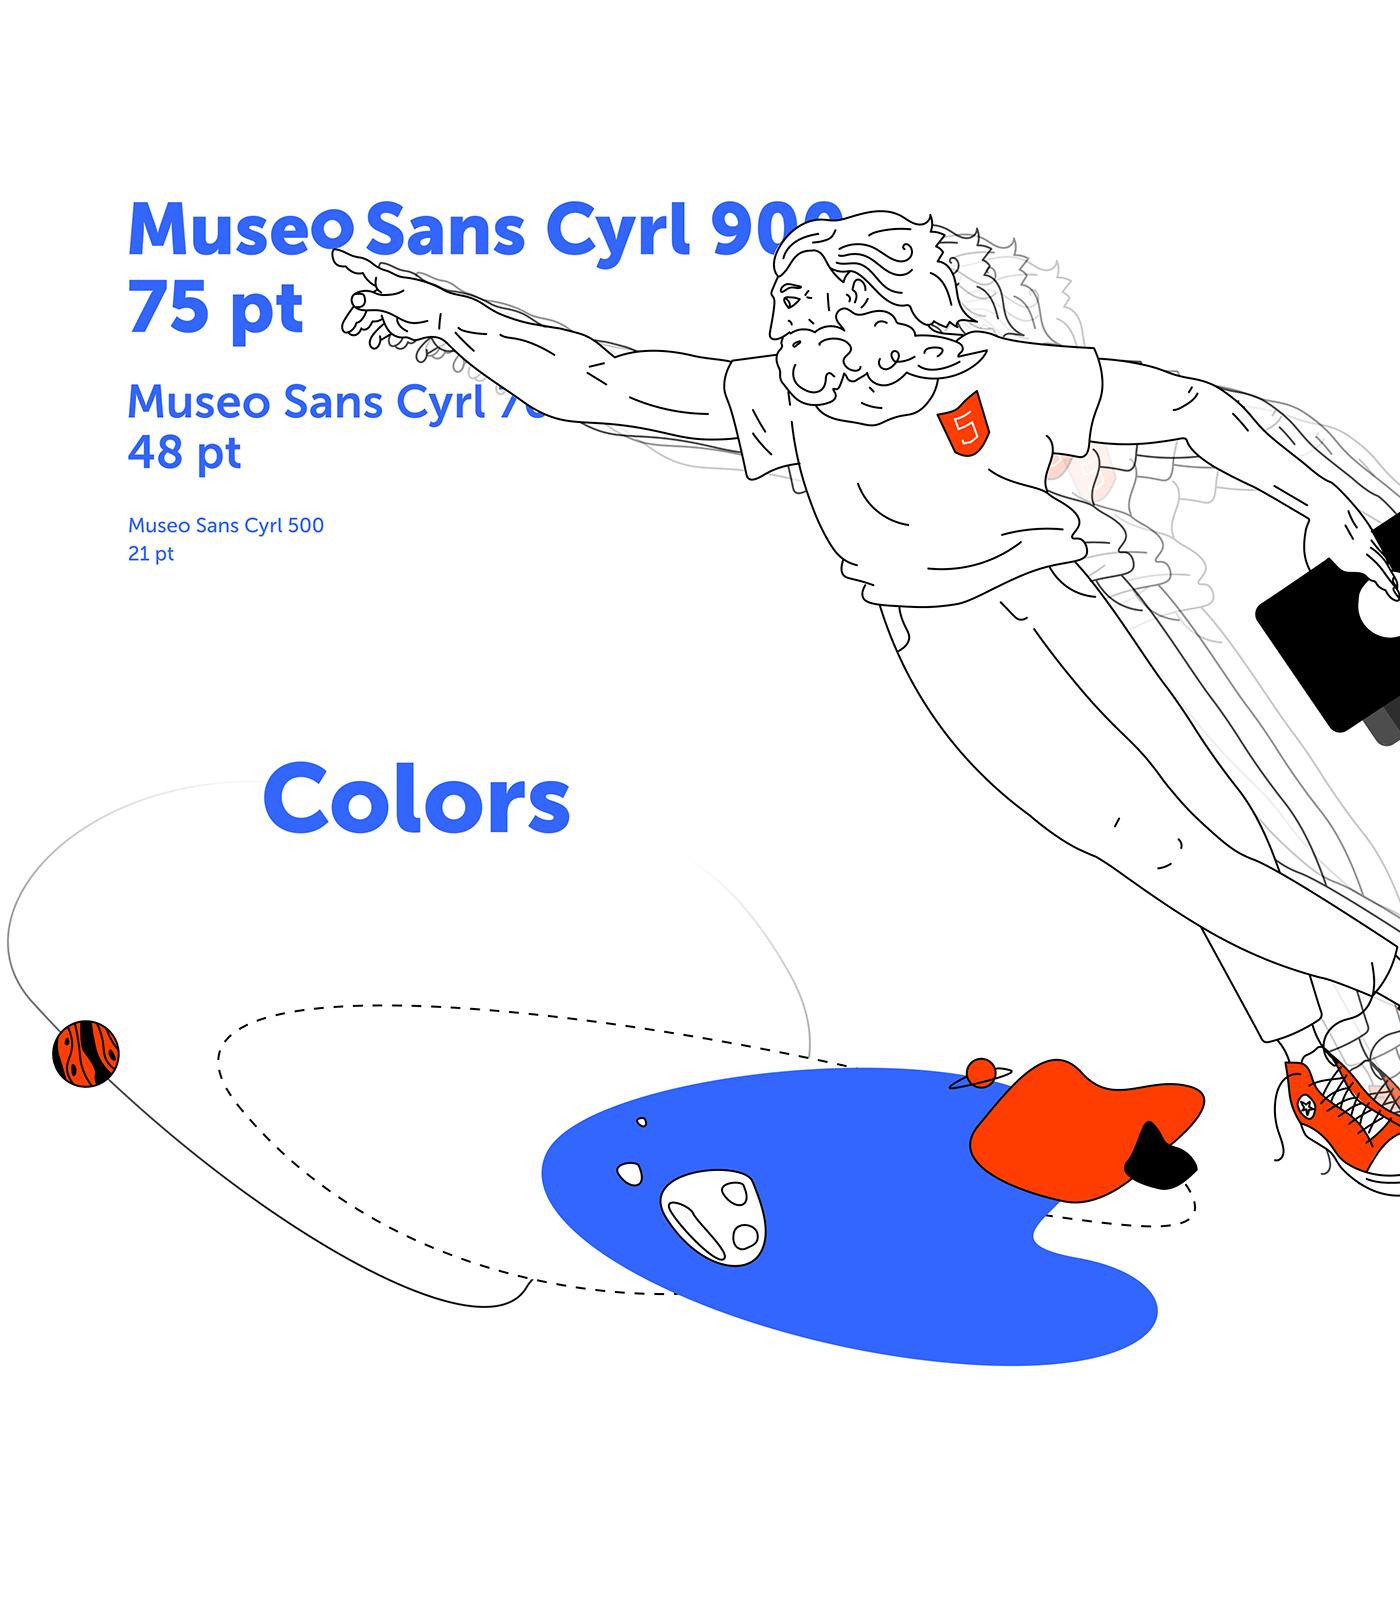 Image may contain: map, cartoon and drawing